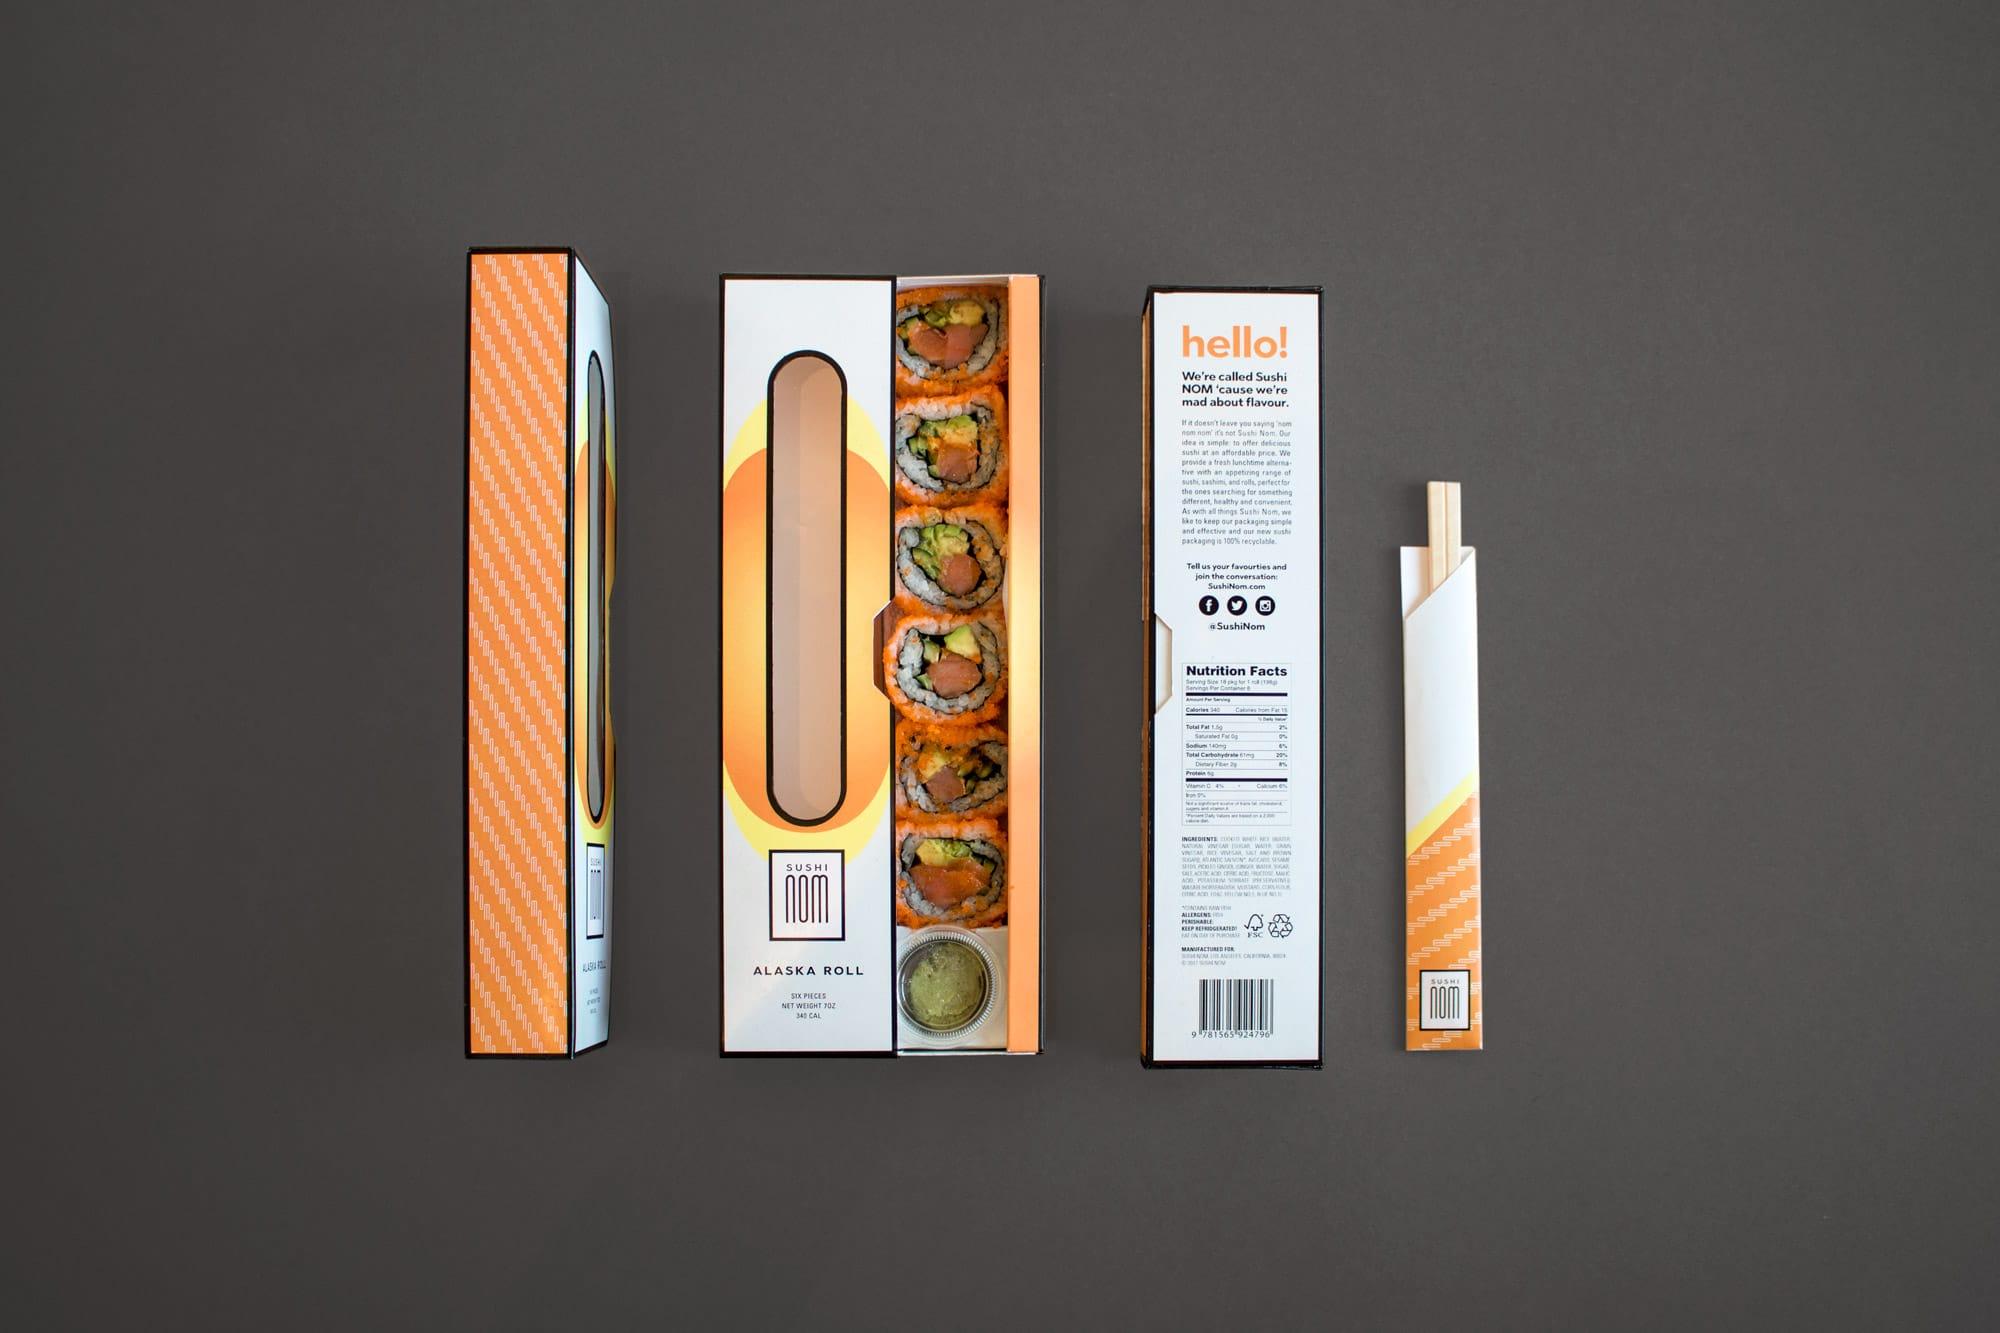 kevin-kwok-design-sushi-nom-1